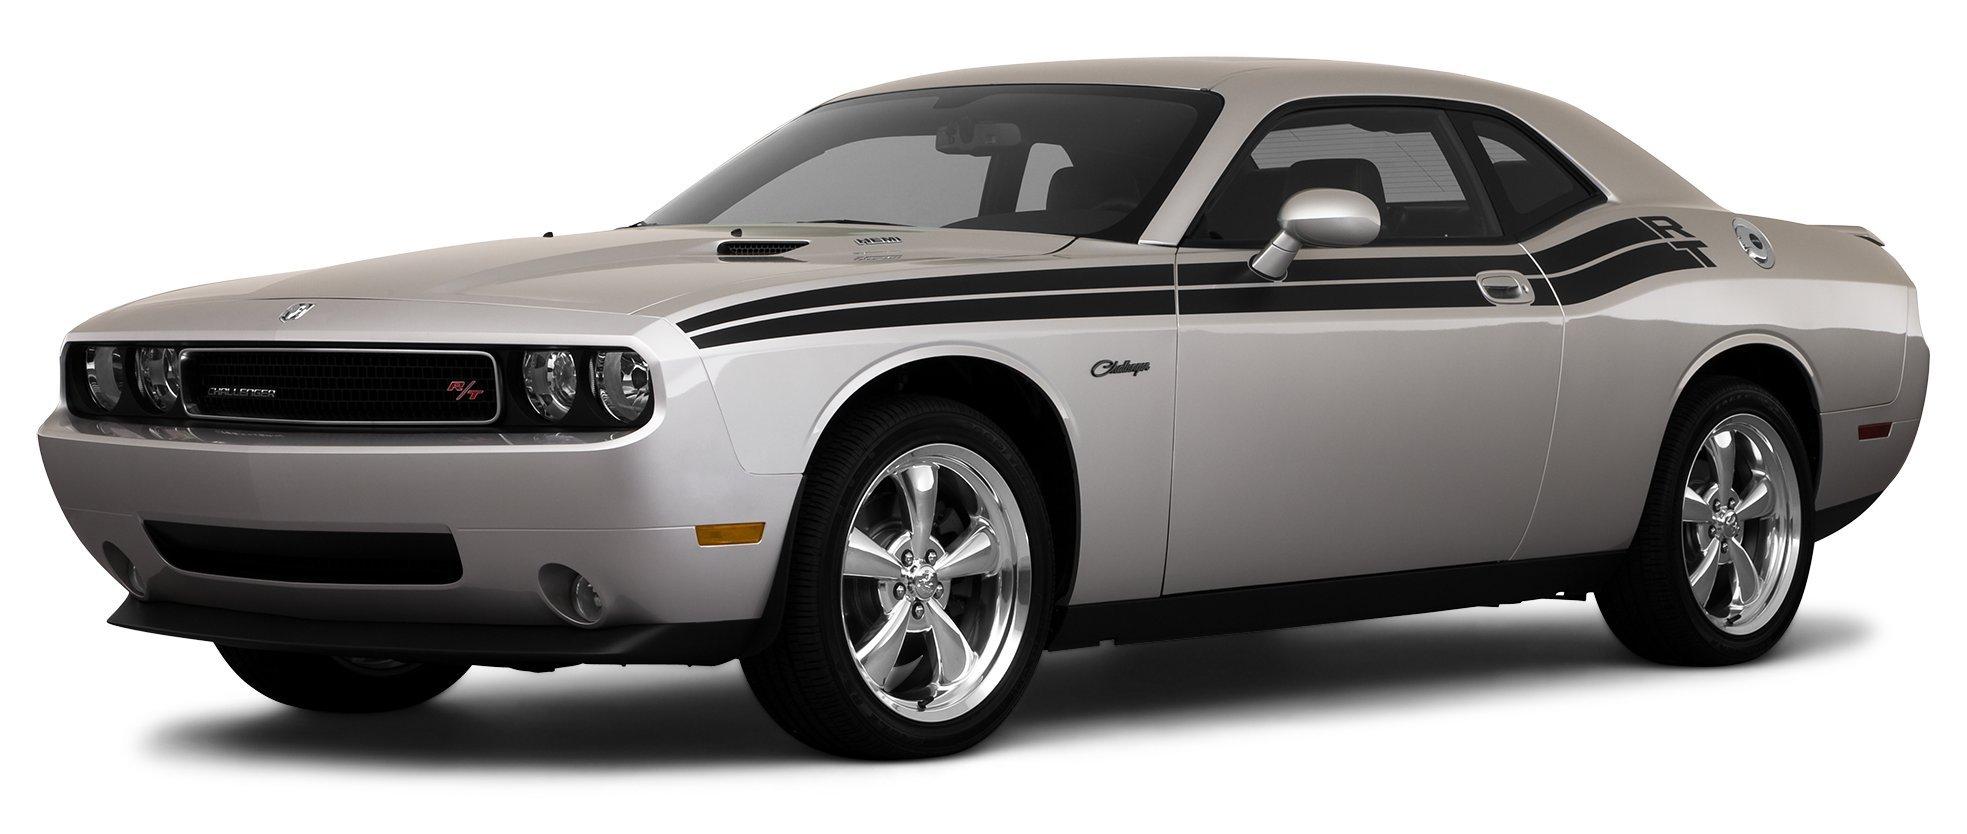 2010 dodge challenger reviews images and specs vehicles. Black Bedroom Furniture Sets. Home Design Ideas